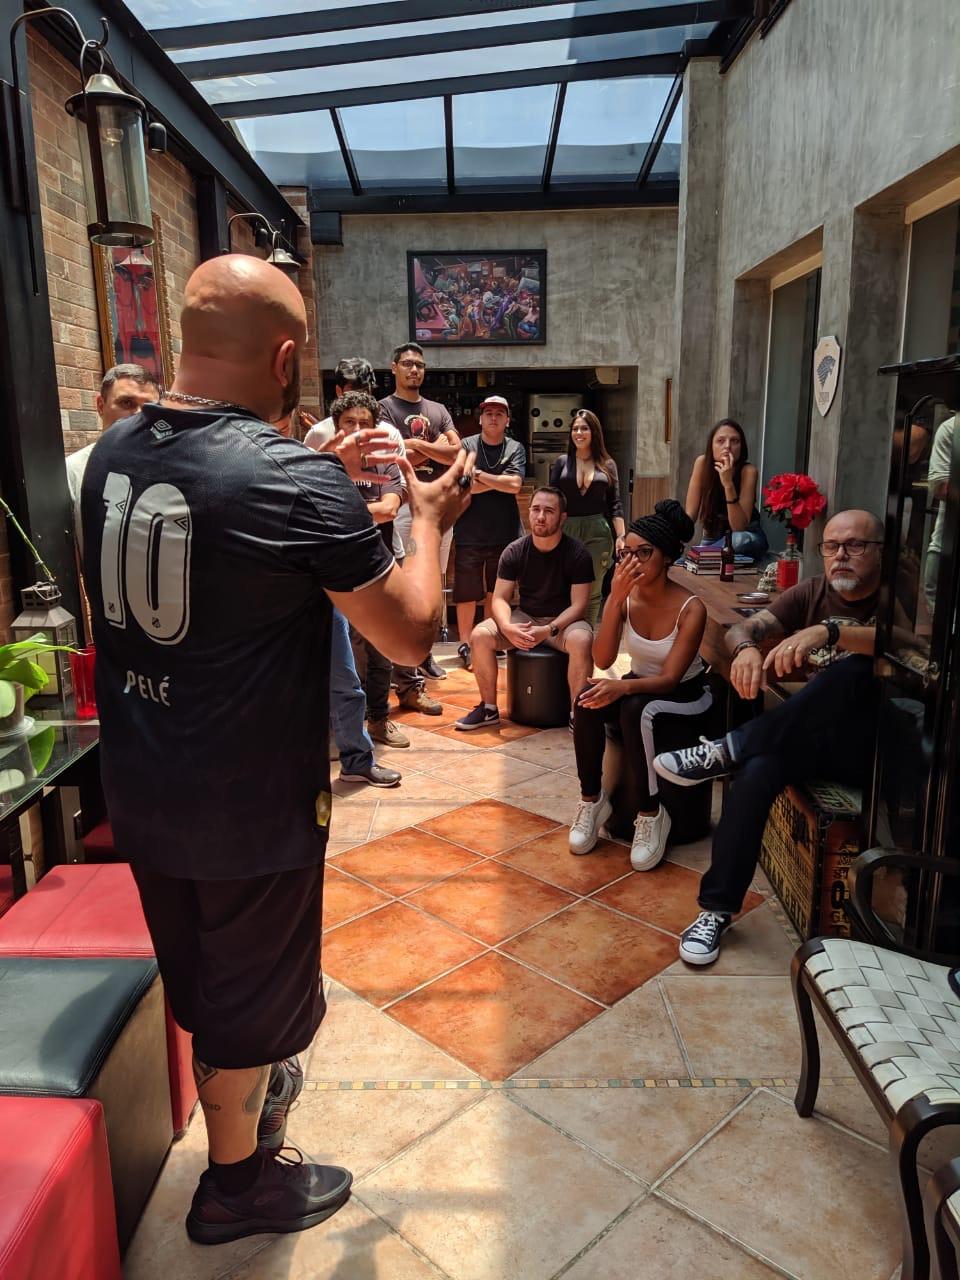 Turma do Workshop, em São Paulo